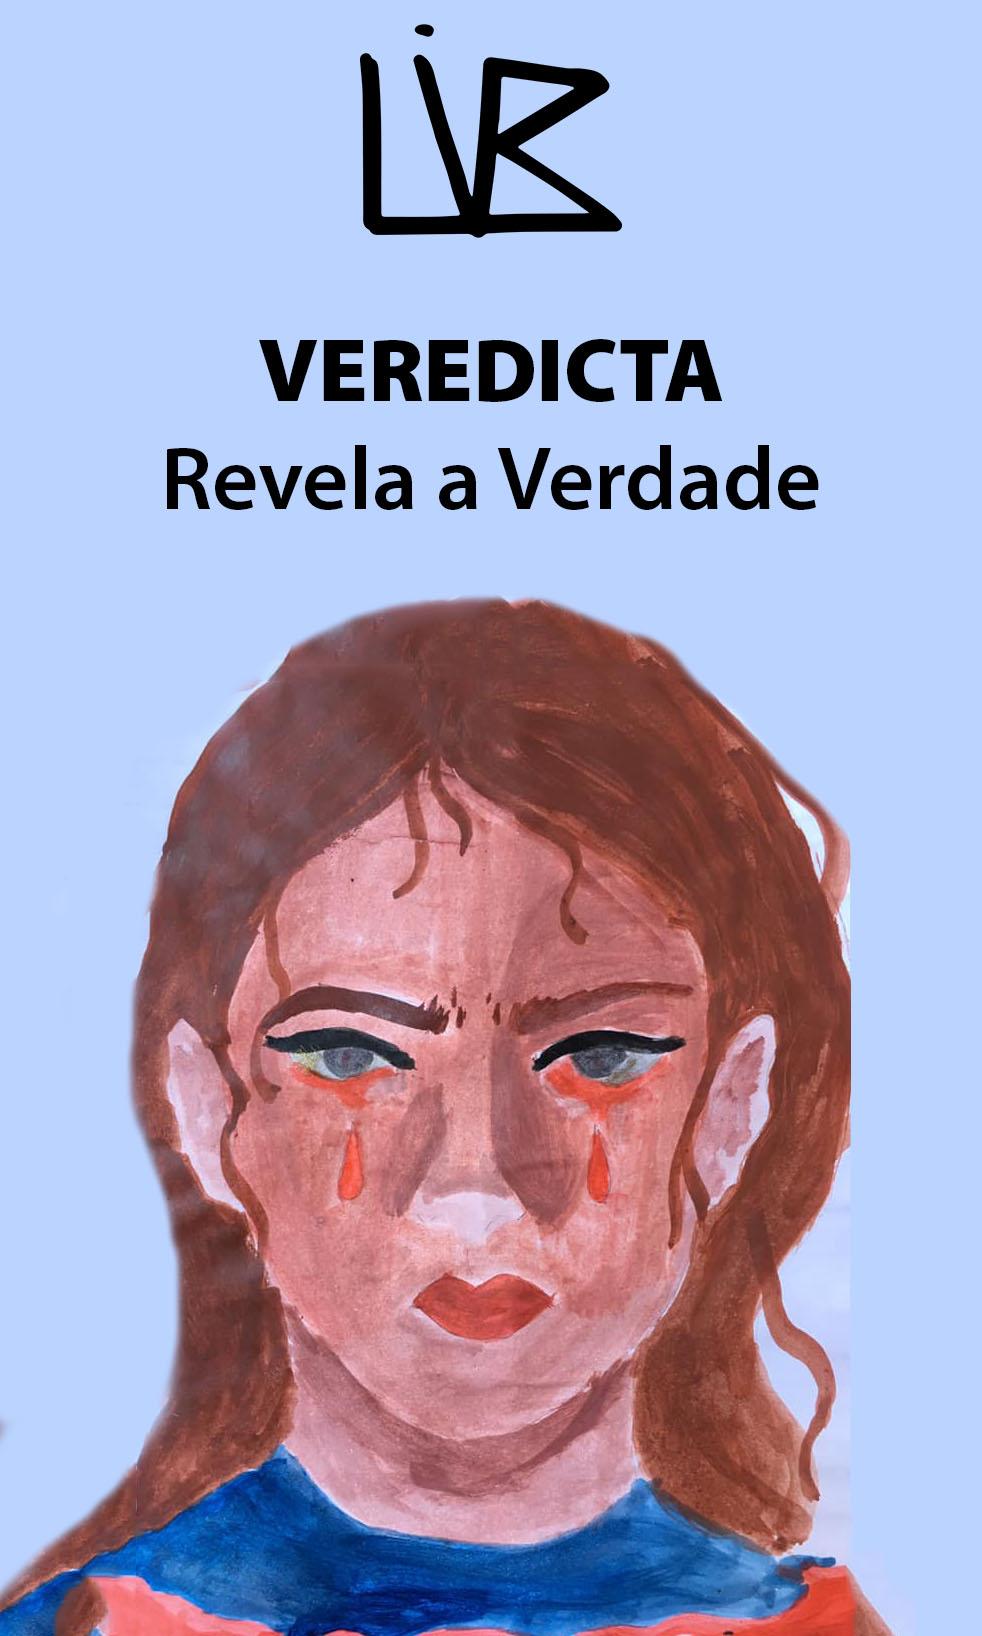 Arte - Veredicta - Magia do Caos